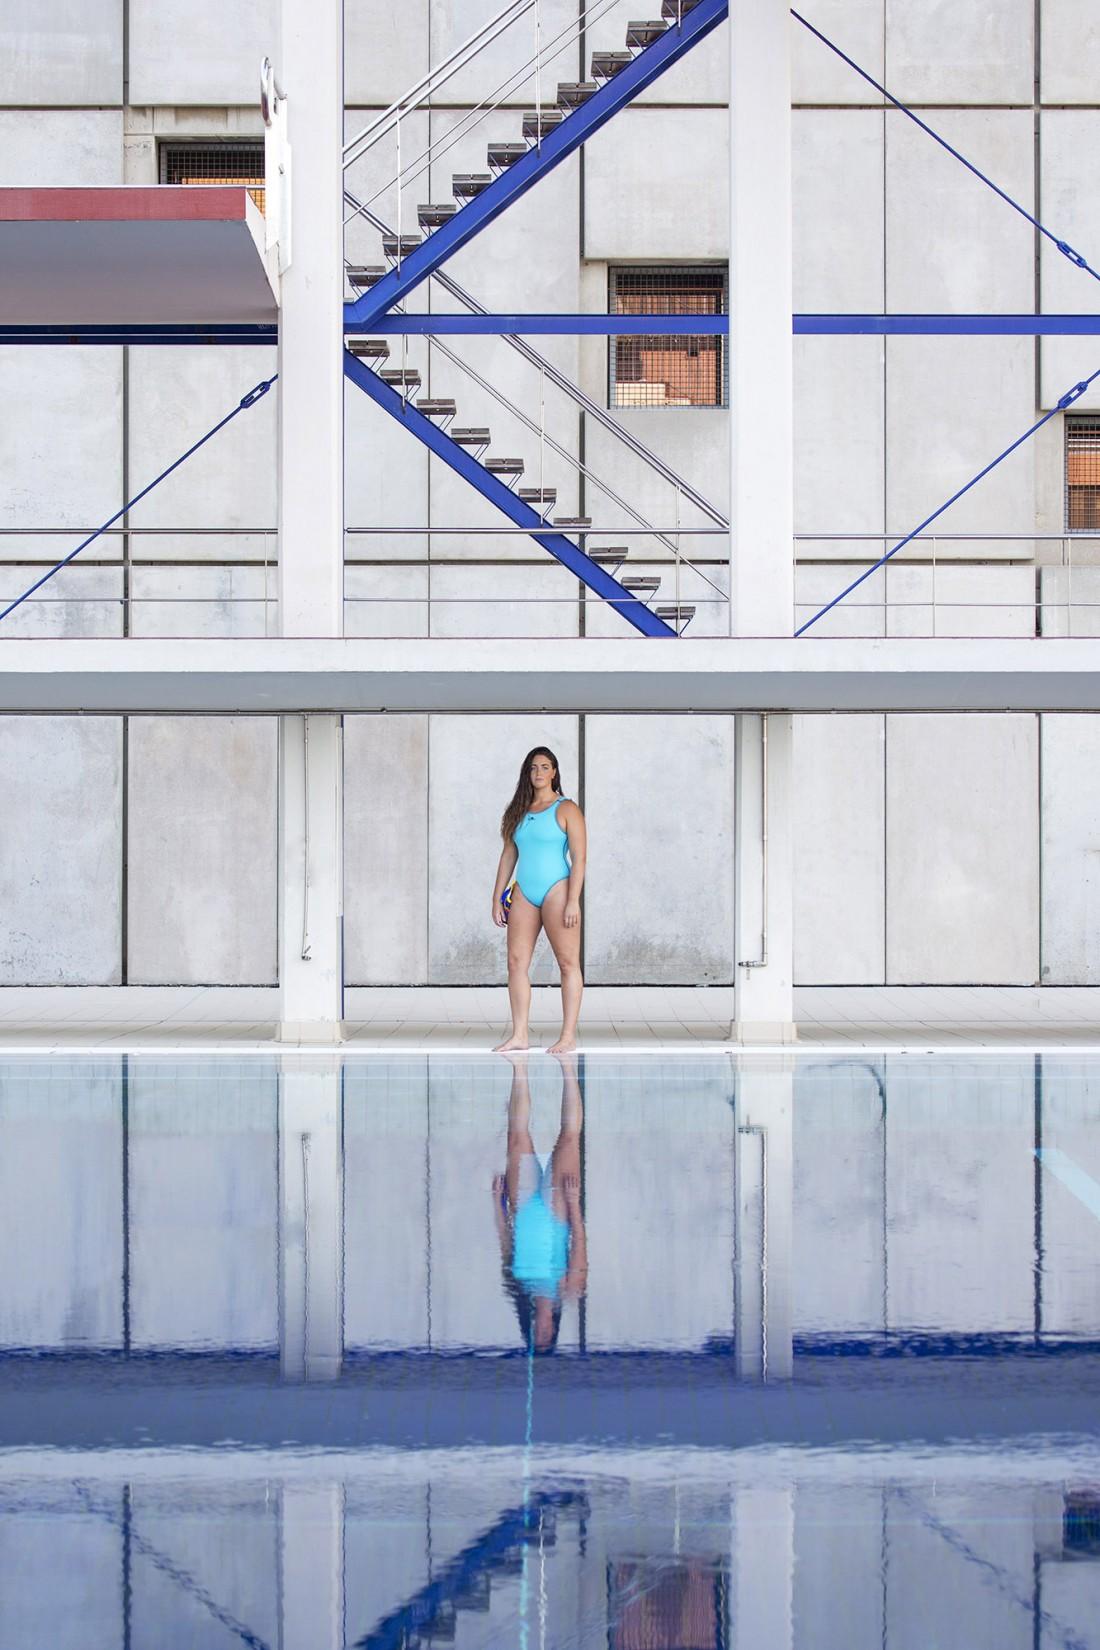 Maica Garcia for Turbo - Joan Sèculi